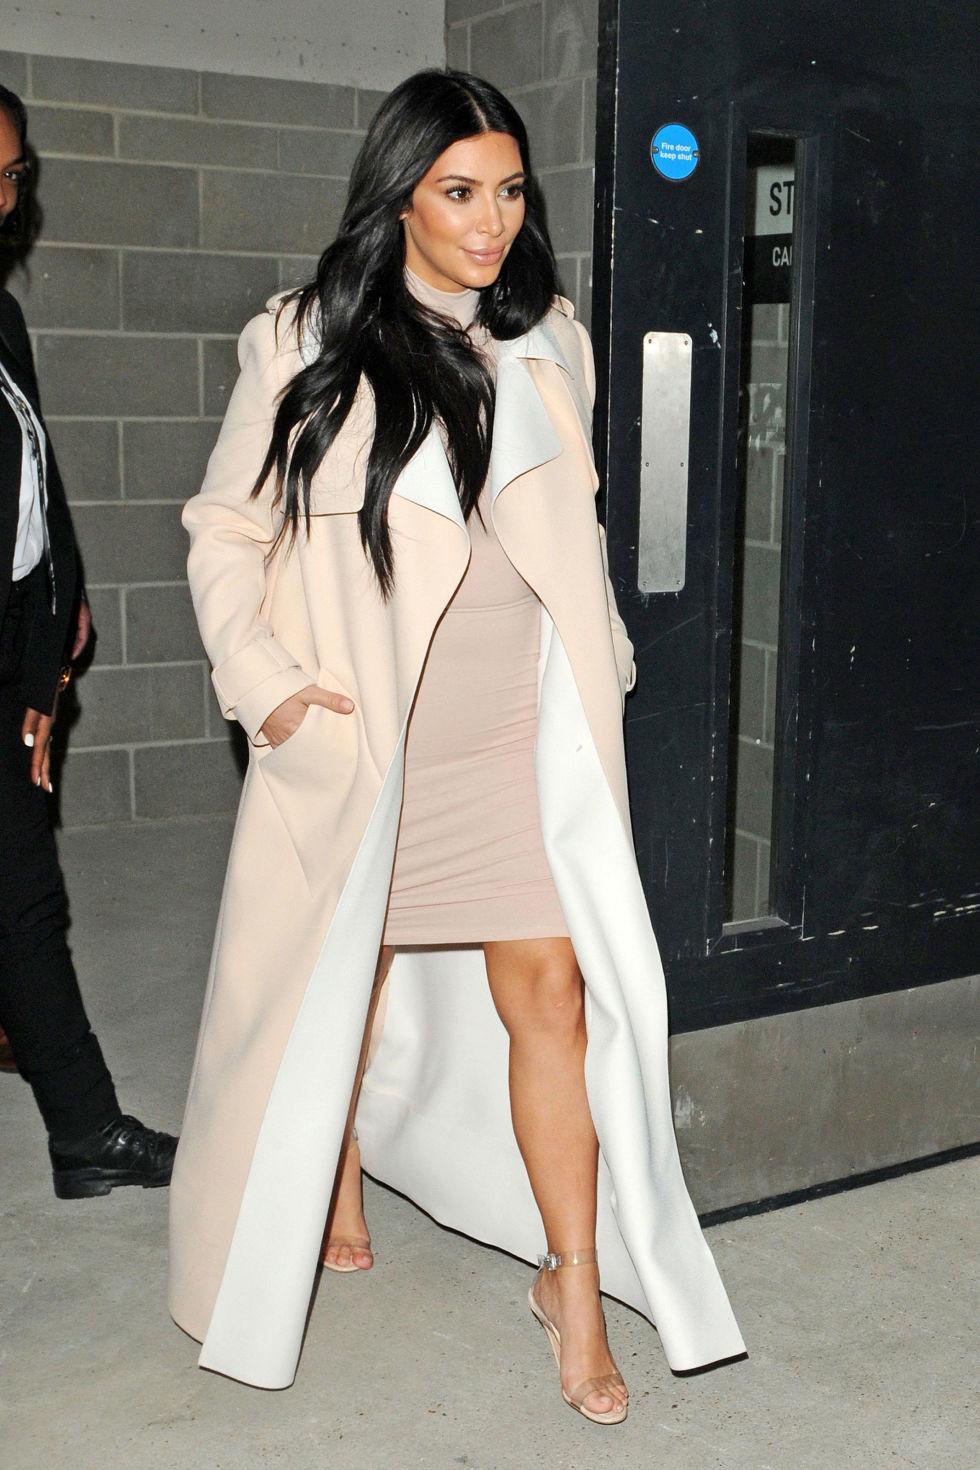 http://mac.h-cdn.co/assets/15/27/980x1470/mcx-kim-kardashian.jpeg